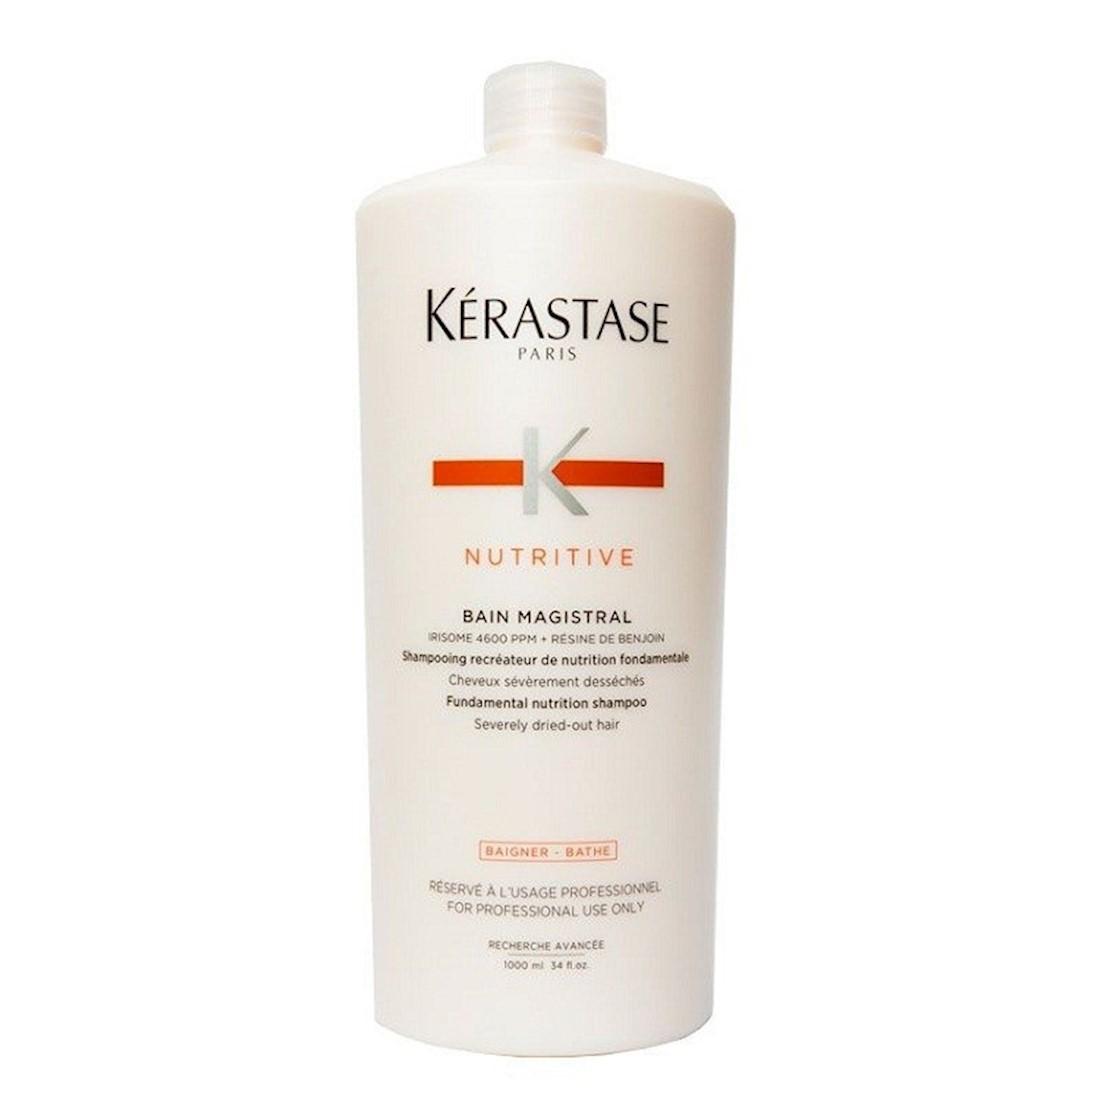 Kérastase Nutritive Bain Magistral - Shampoo 1L - CA